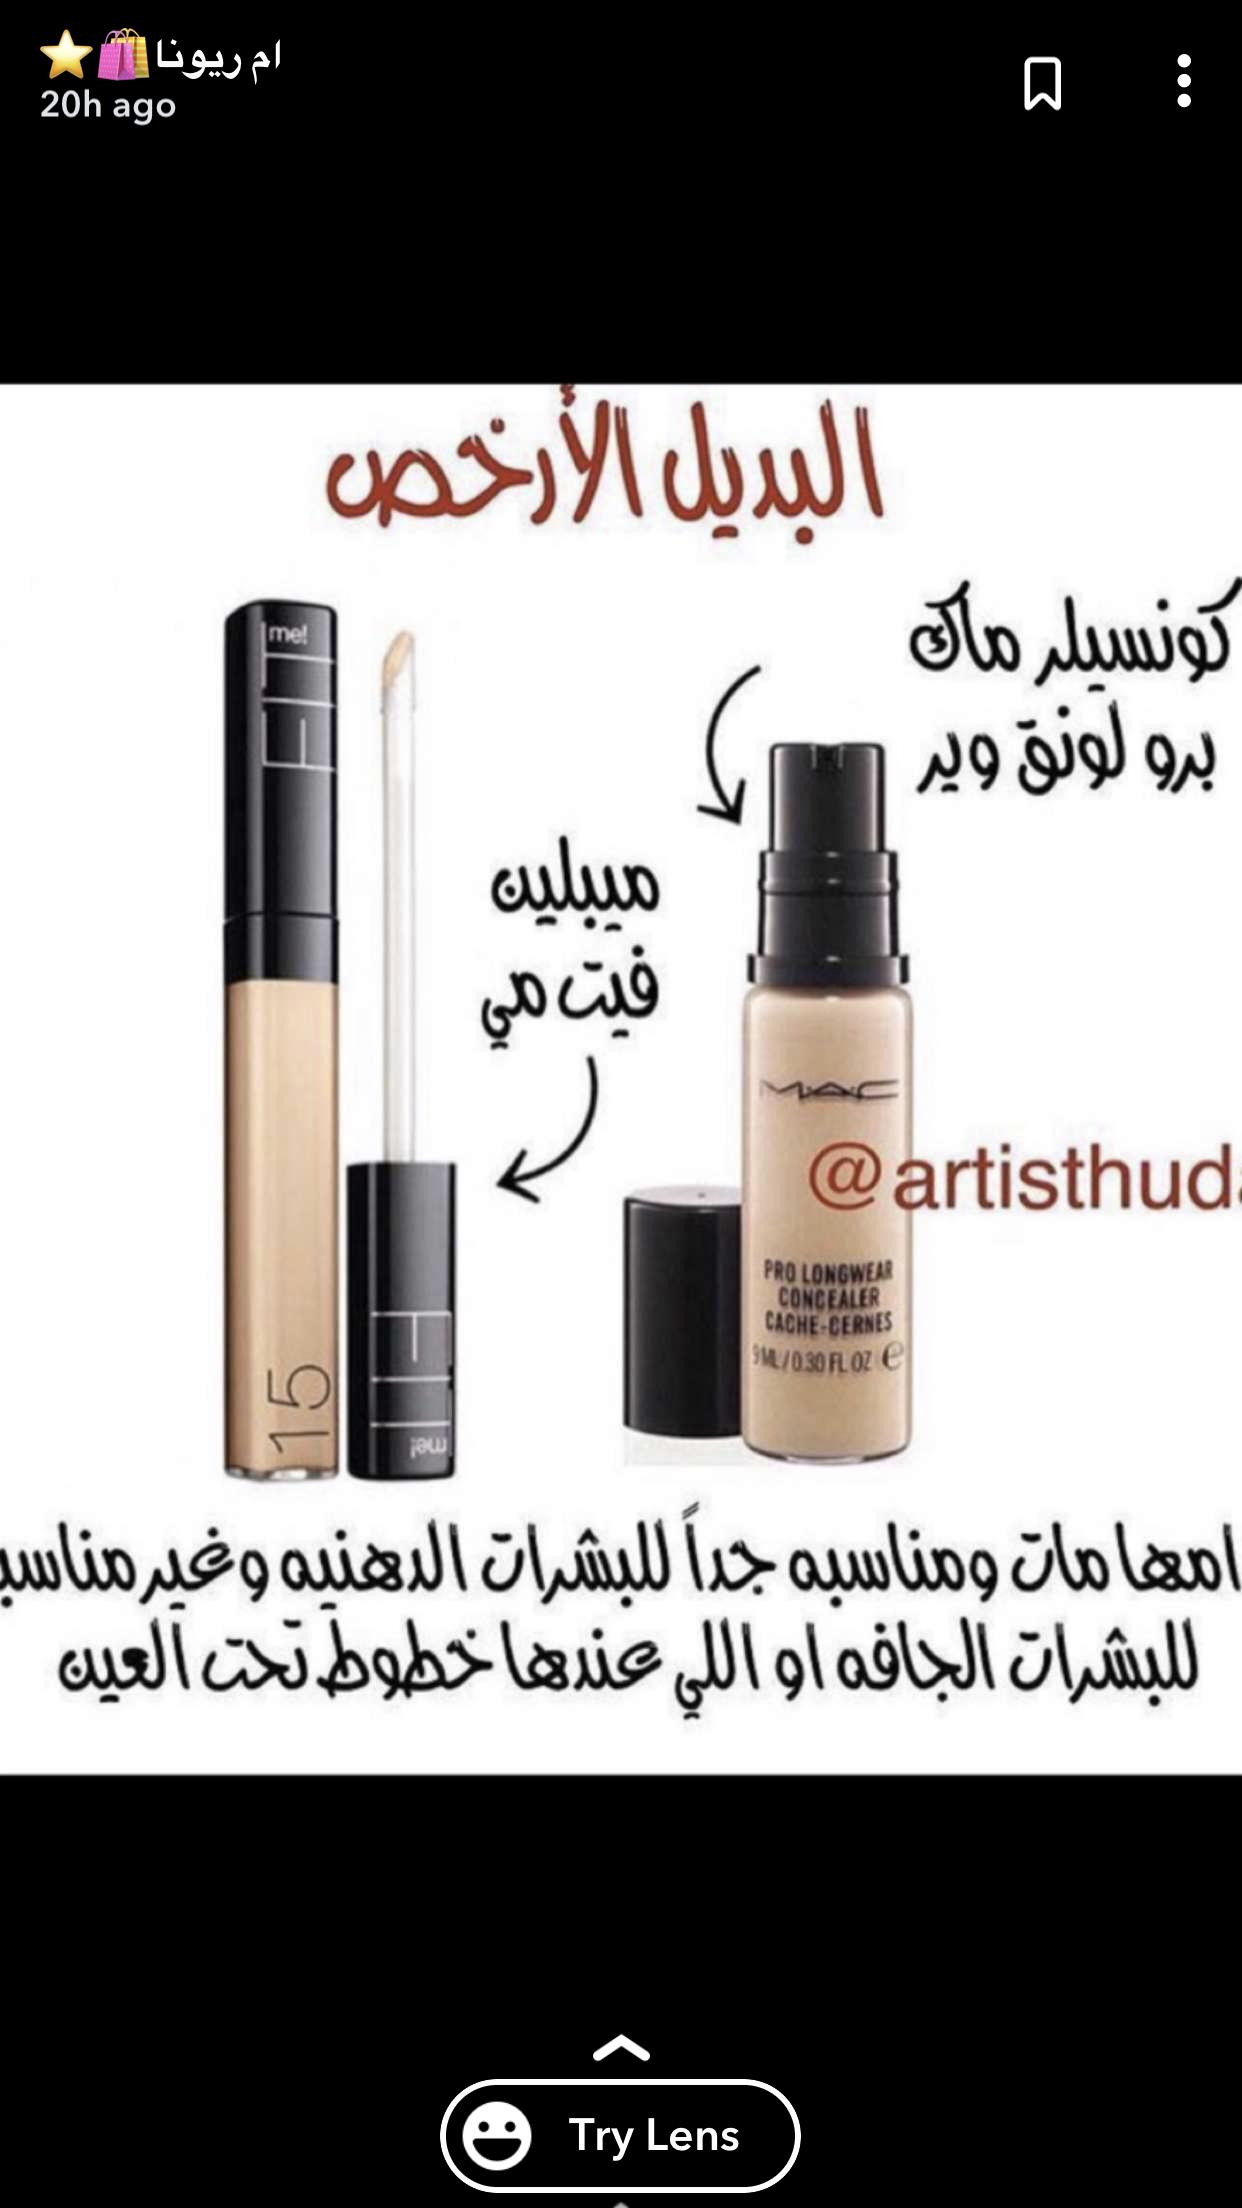 Pin By شيهانه ميمي الشهراني On نصايح Concealer Lipstick Lens